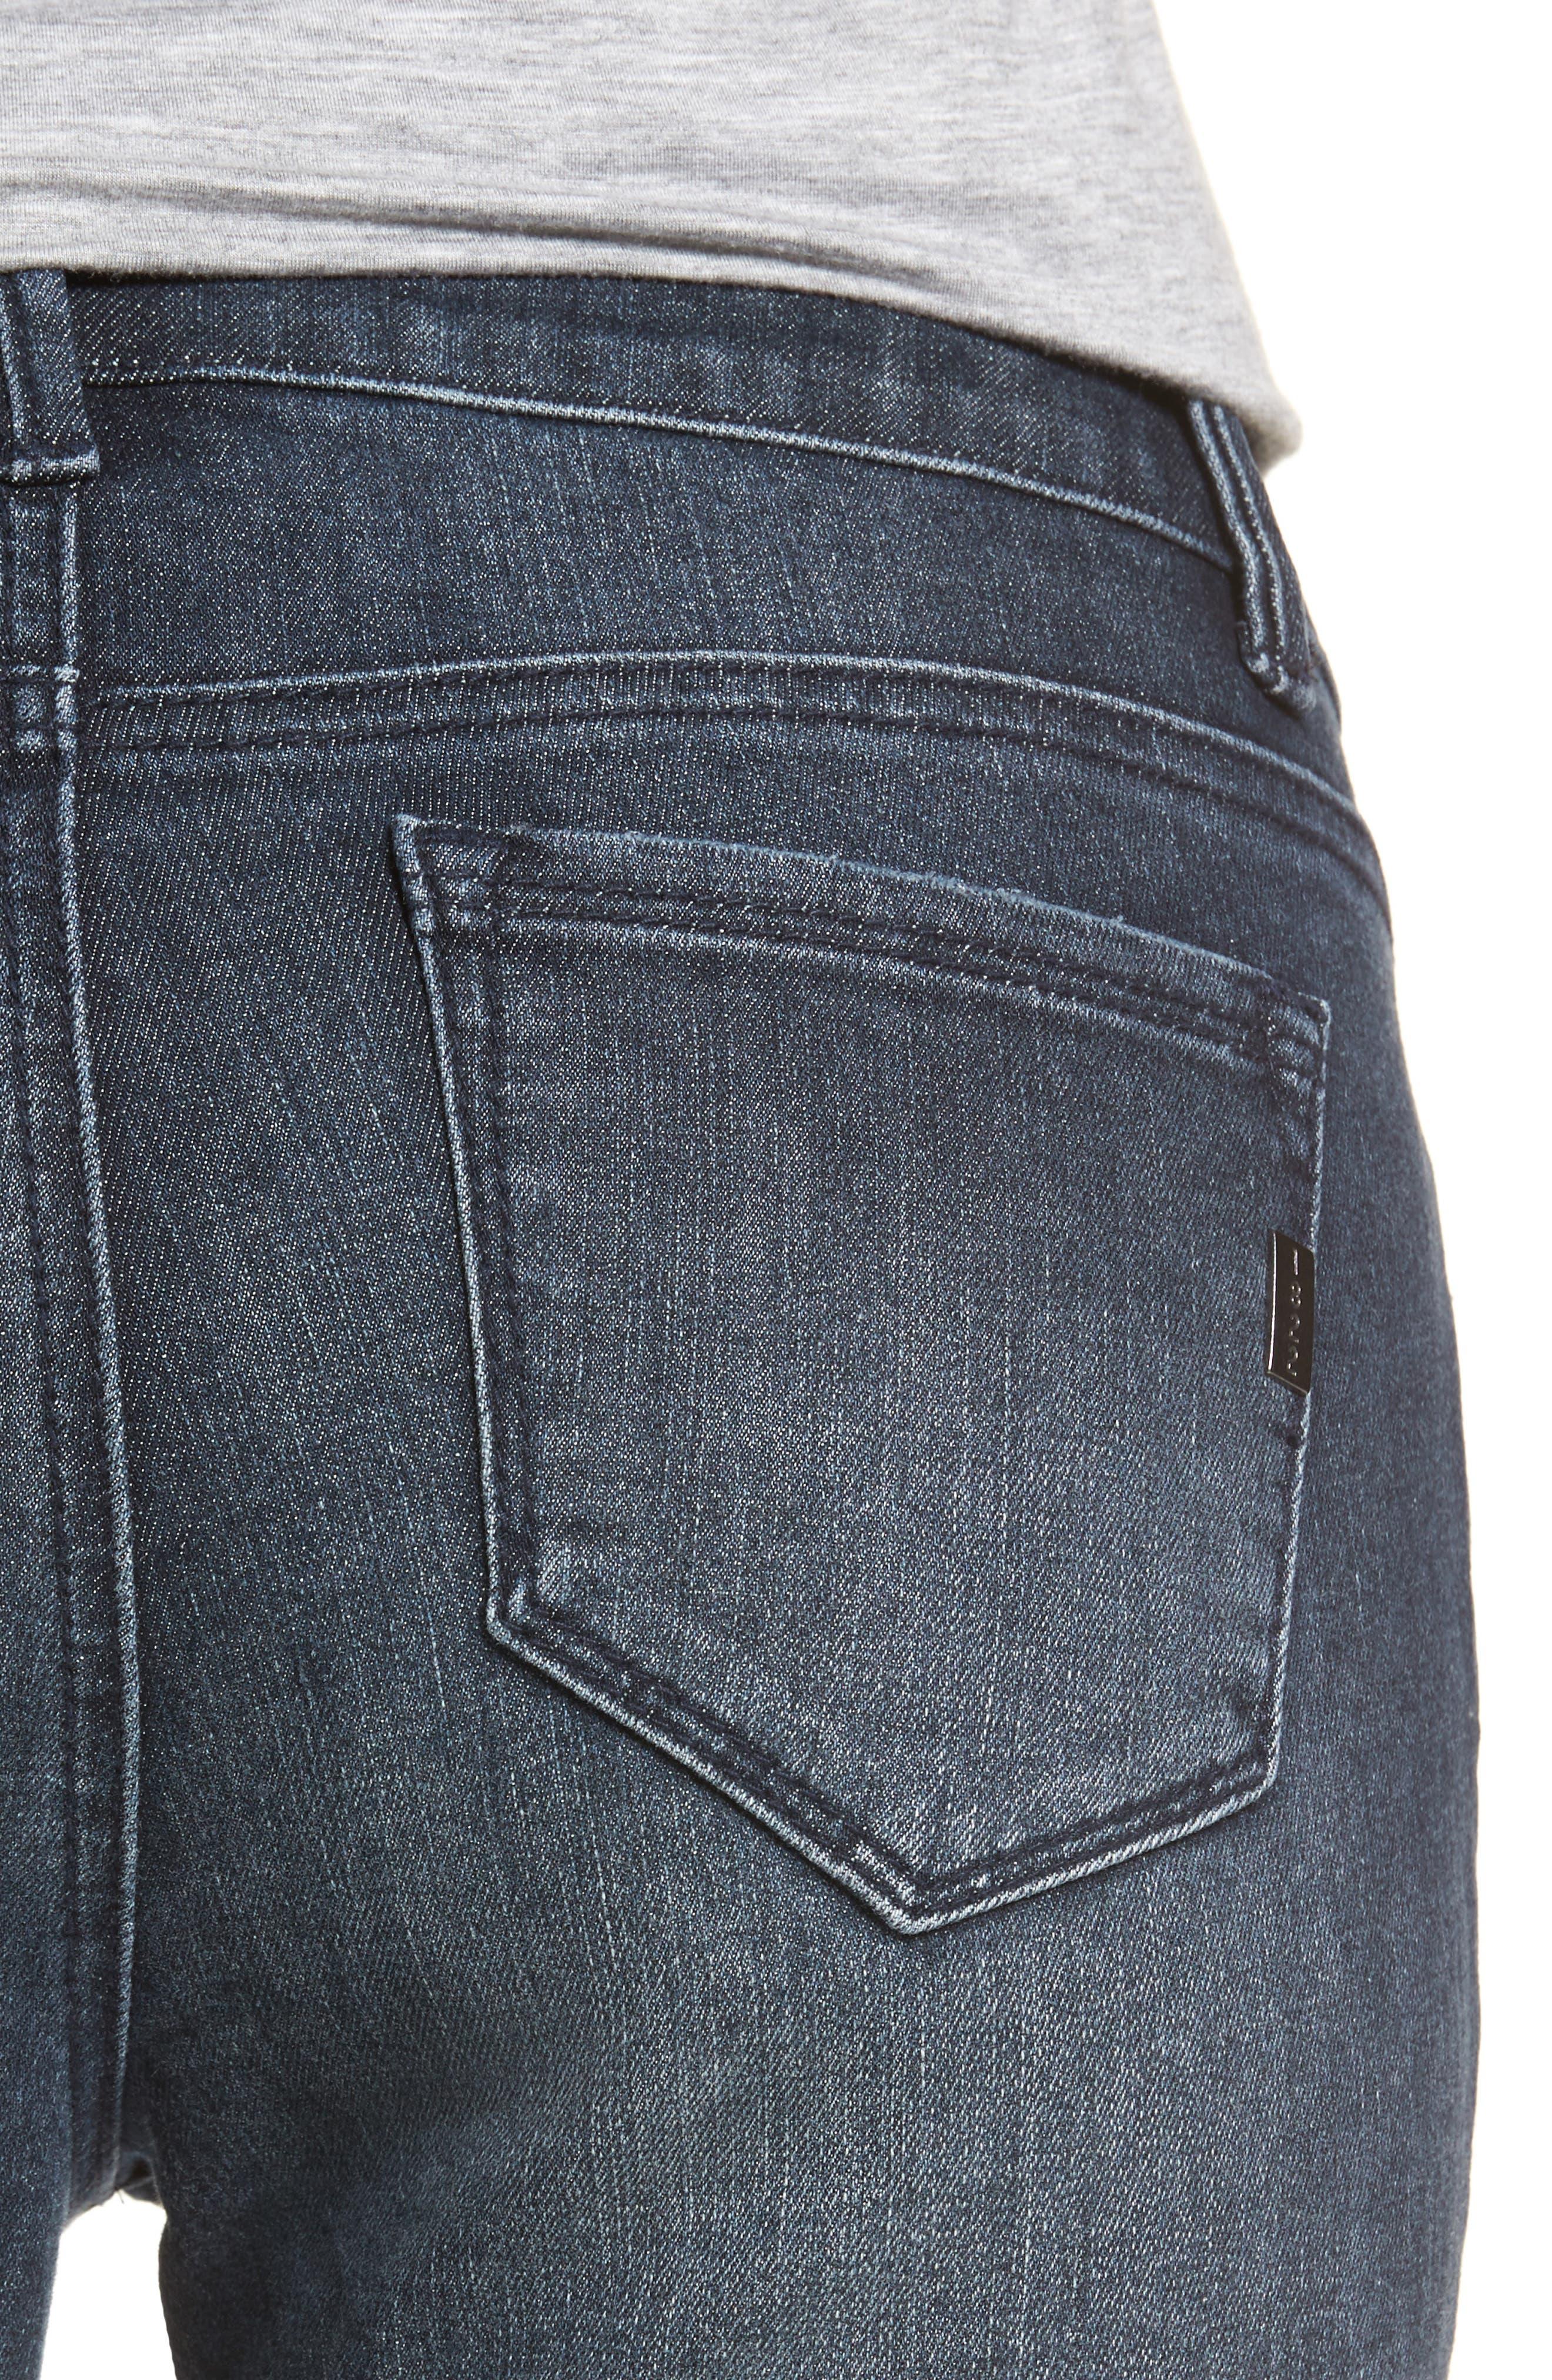 Alternate Image 4  - 1822 Denim Distressed Skinny Jeans (Palin)